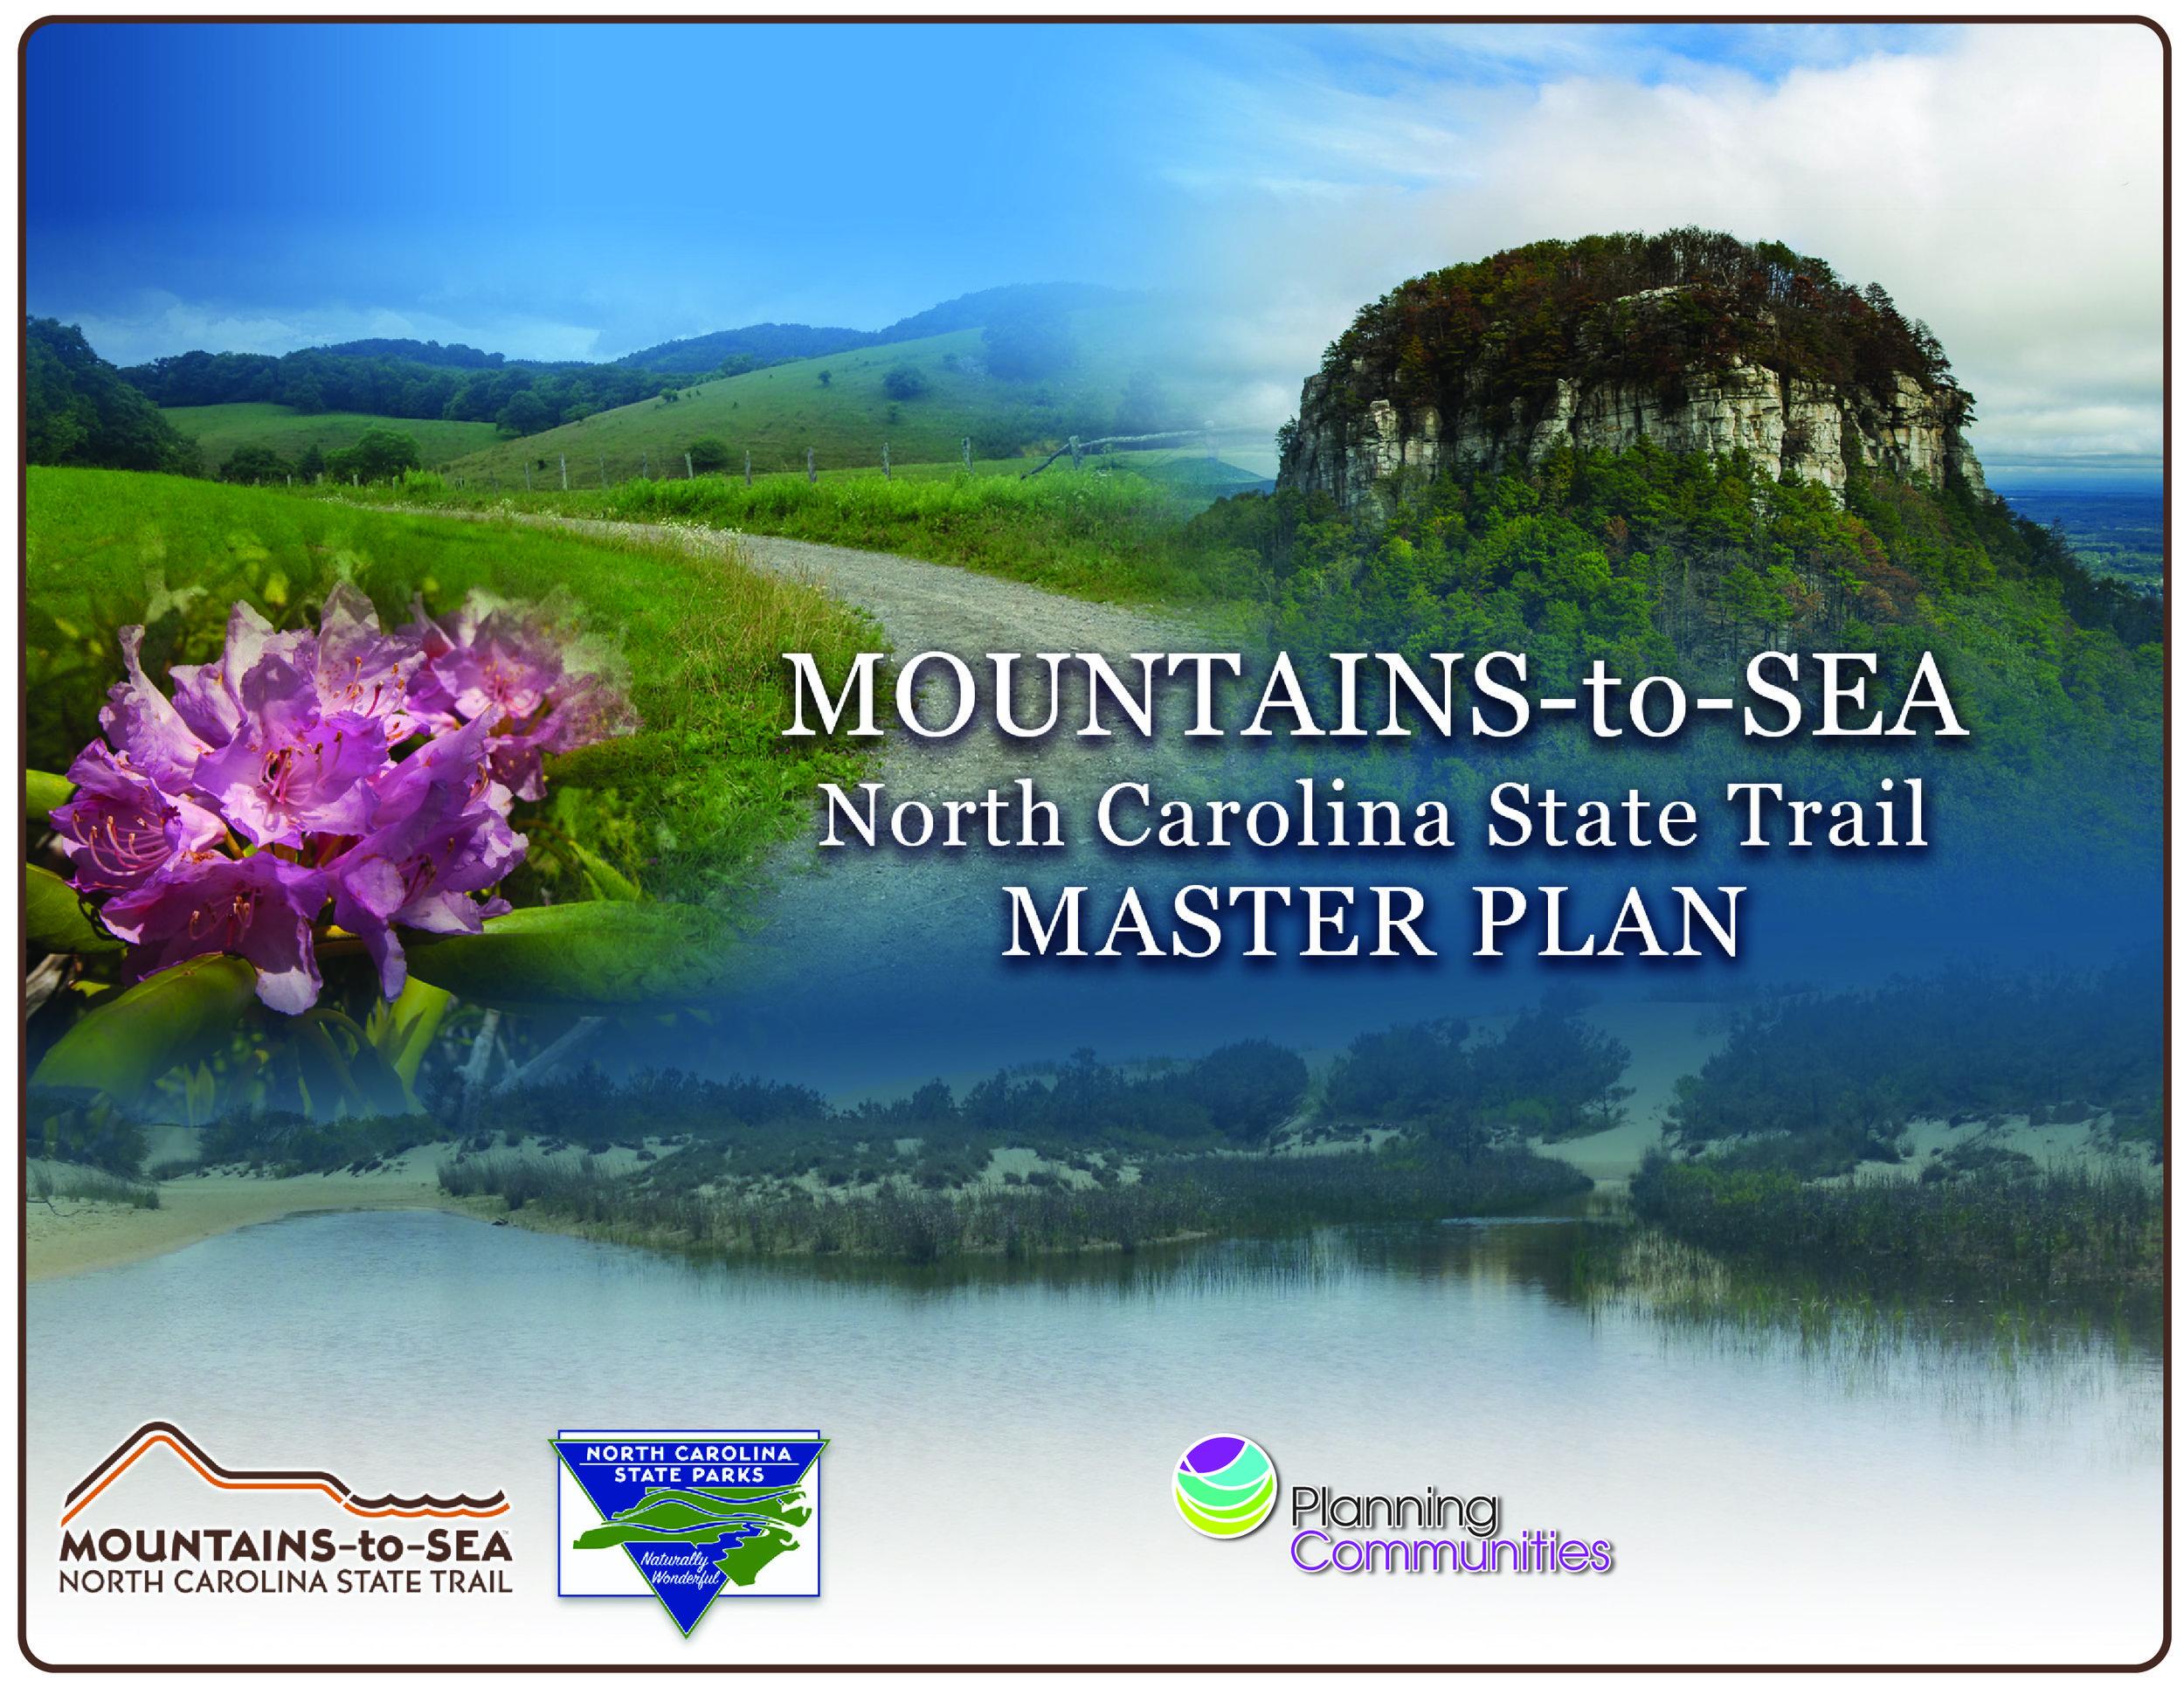 Mountains-to-Sea State Trail Master Plan